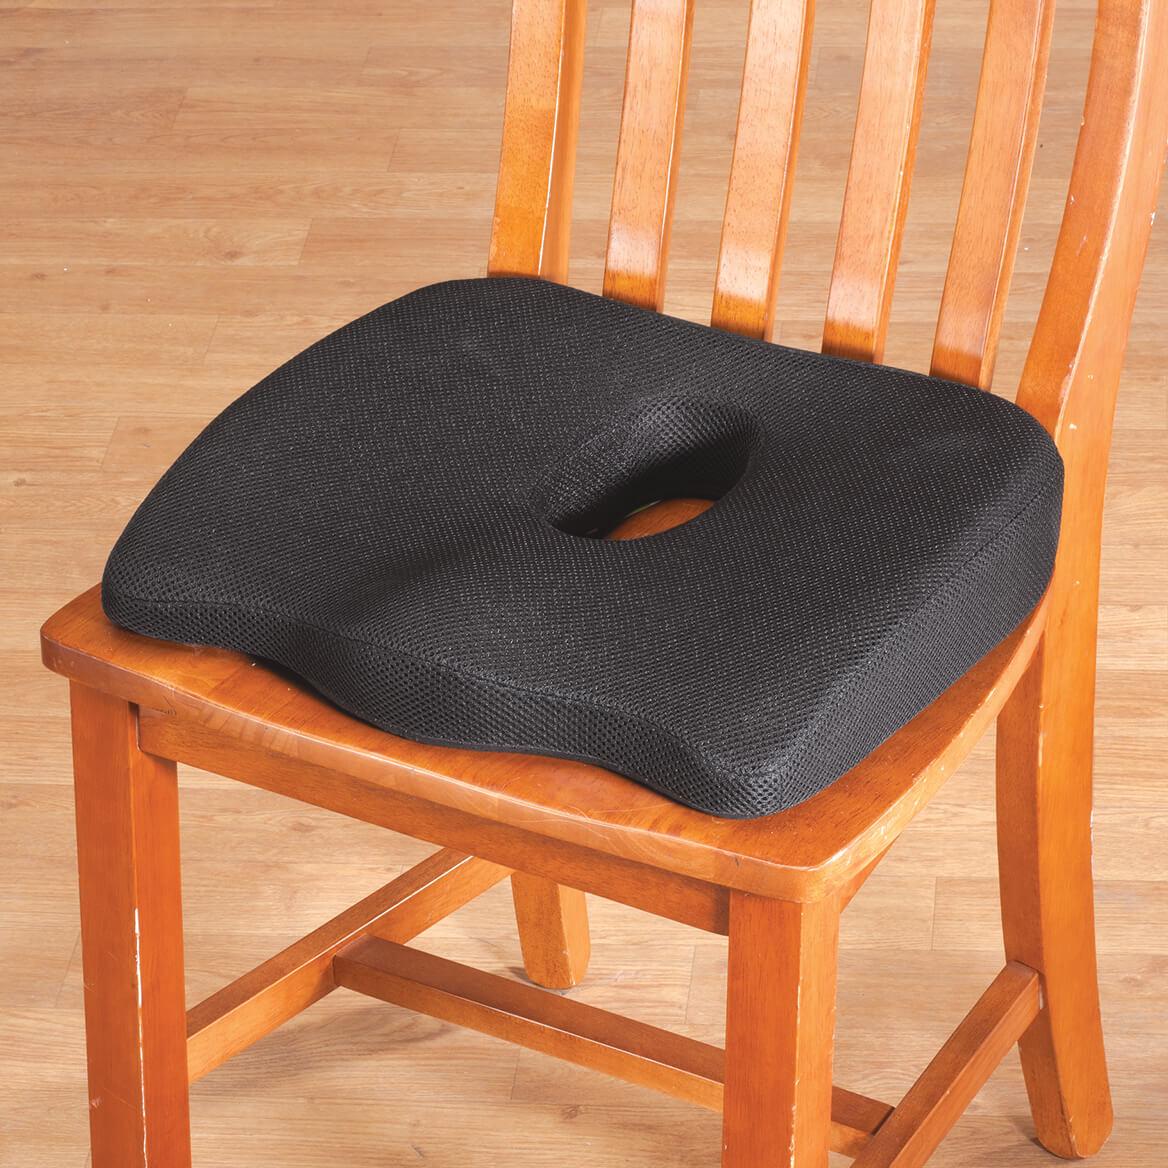 Orthopedic Seat Cushion-360996